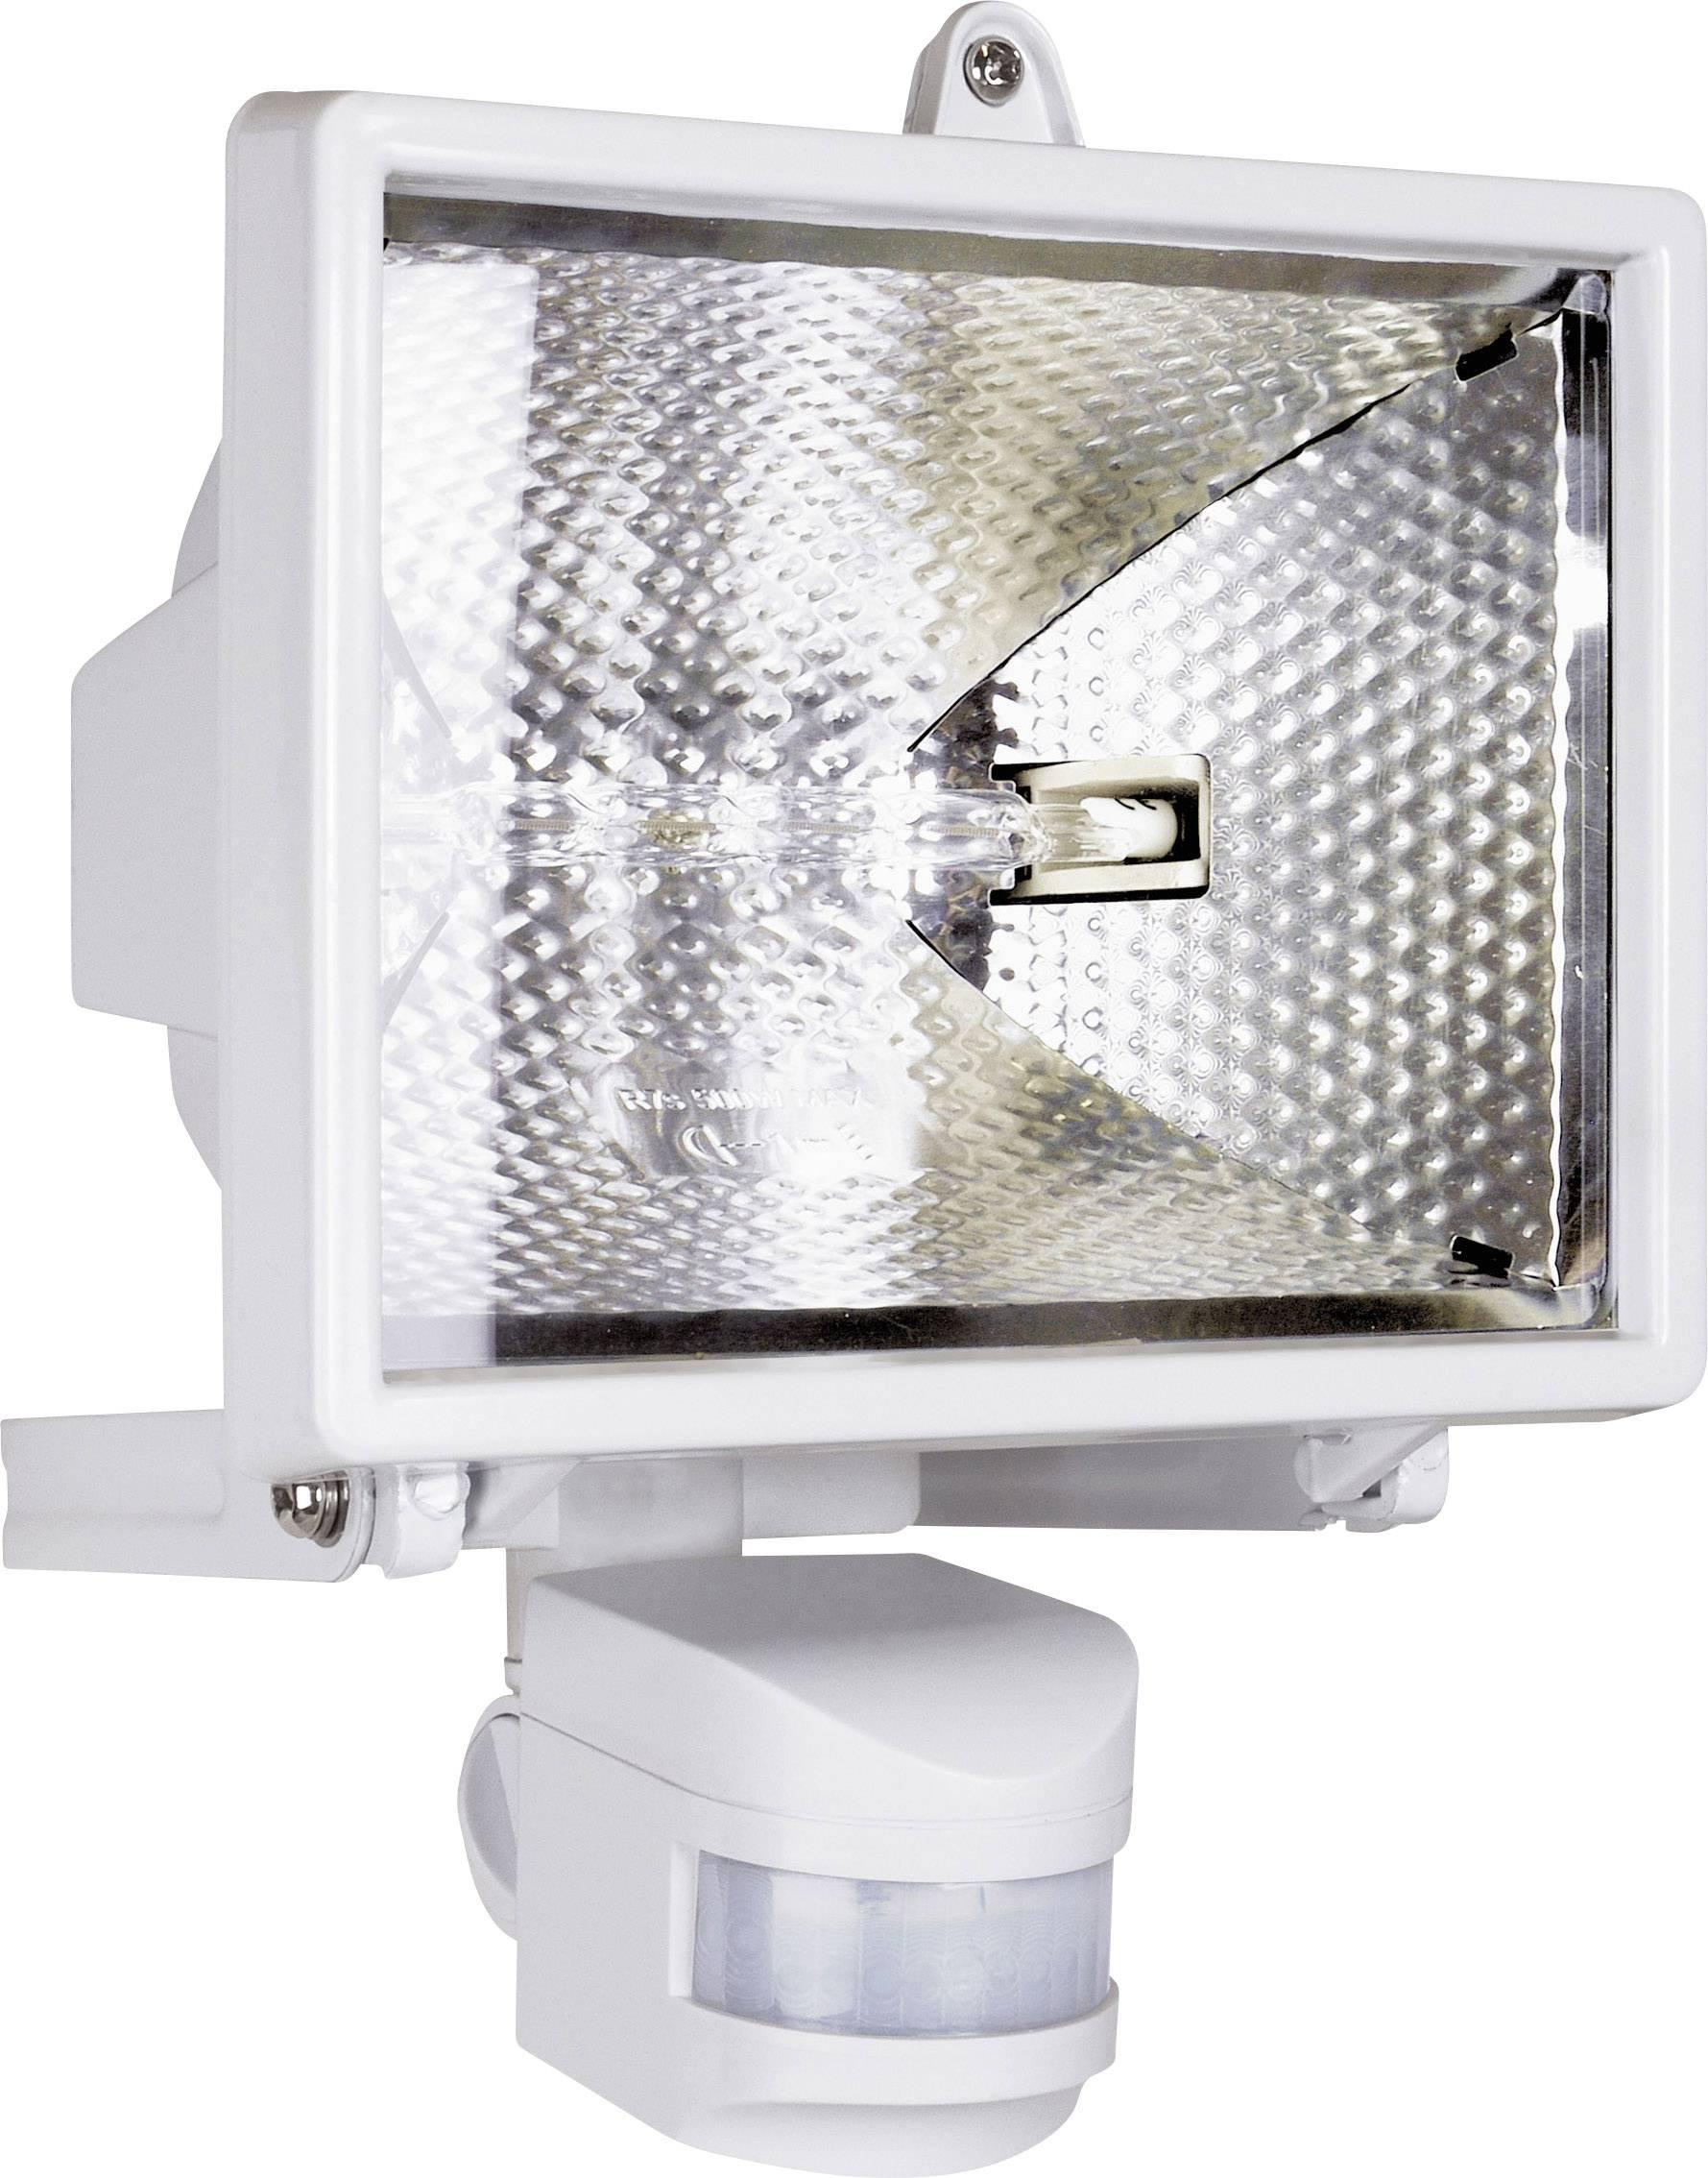 Halogénový reflektor s detektorom pohybu, R7s, 400 W, IP44, biely